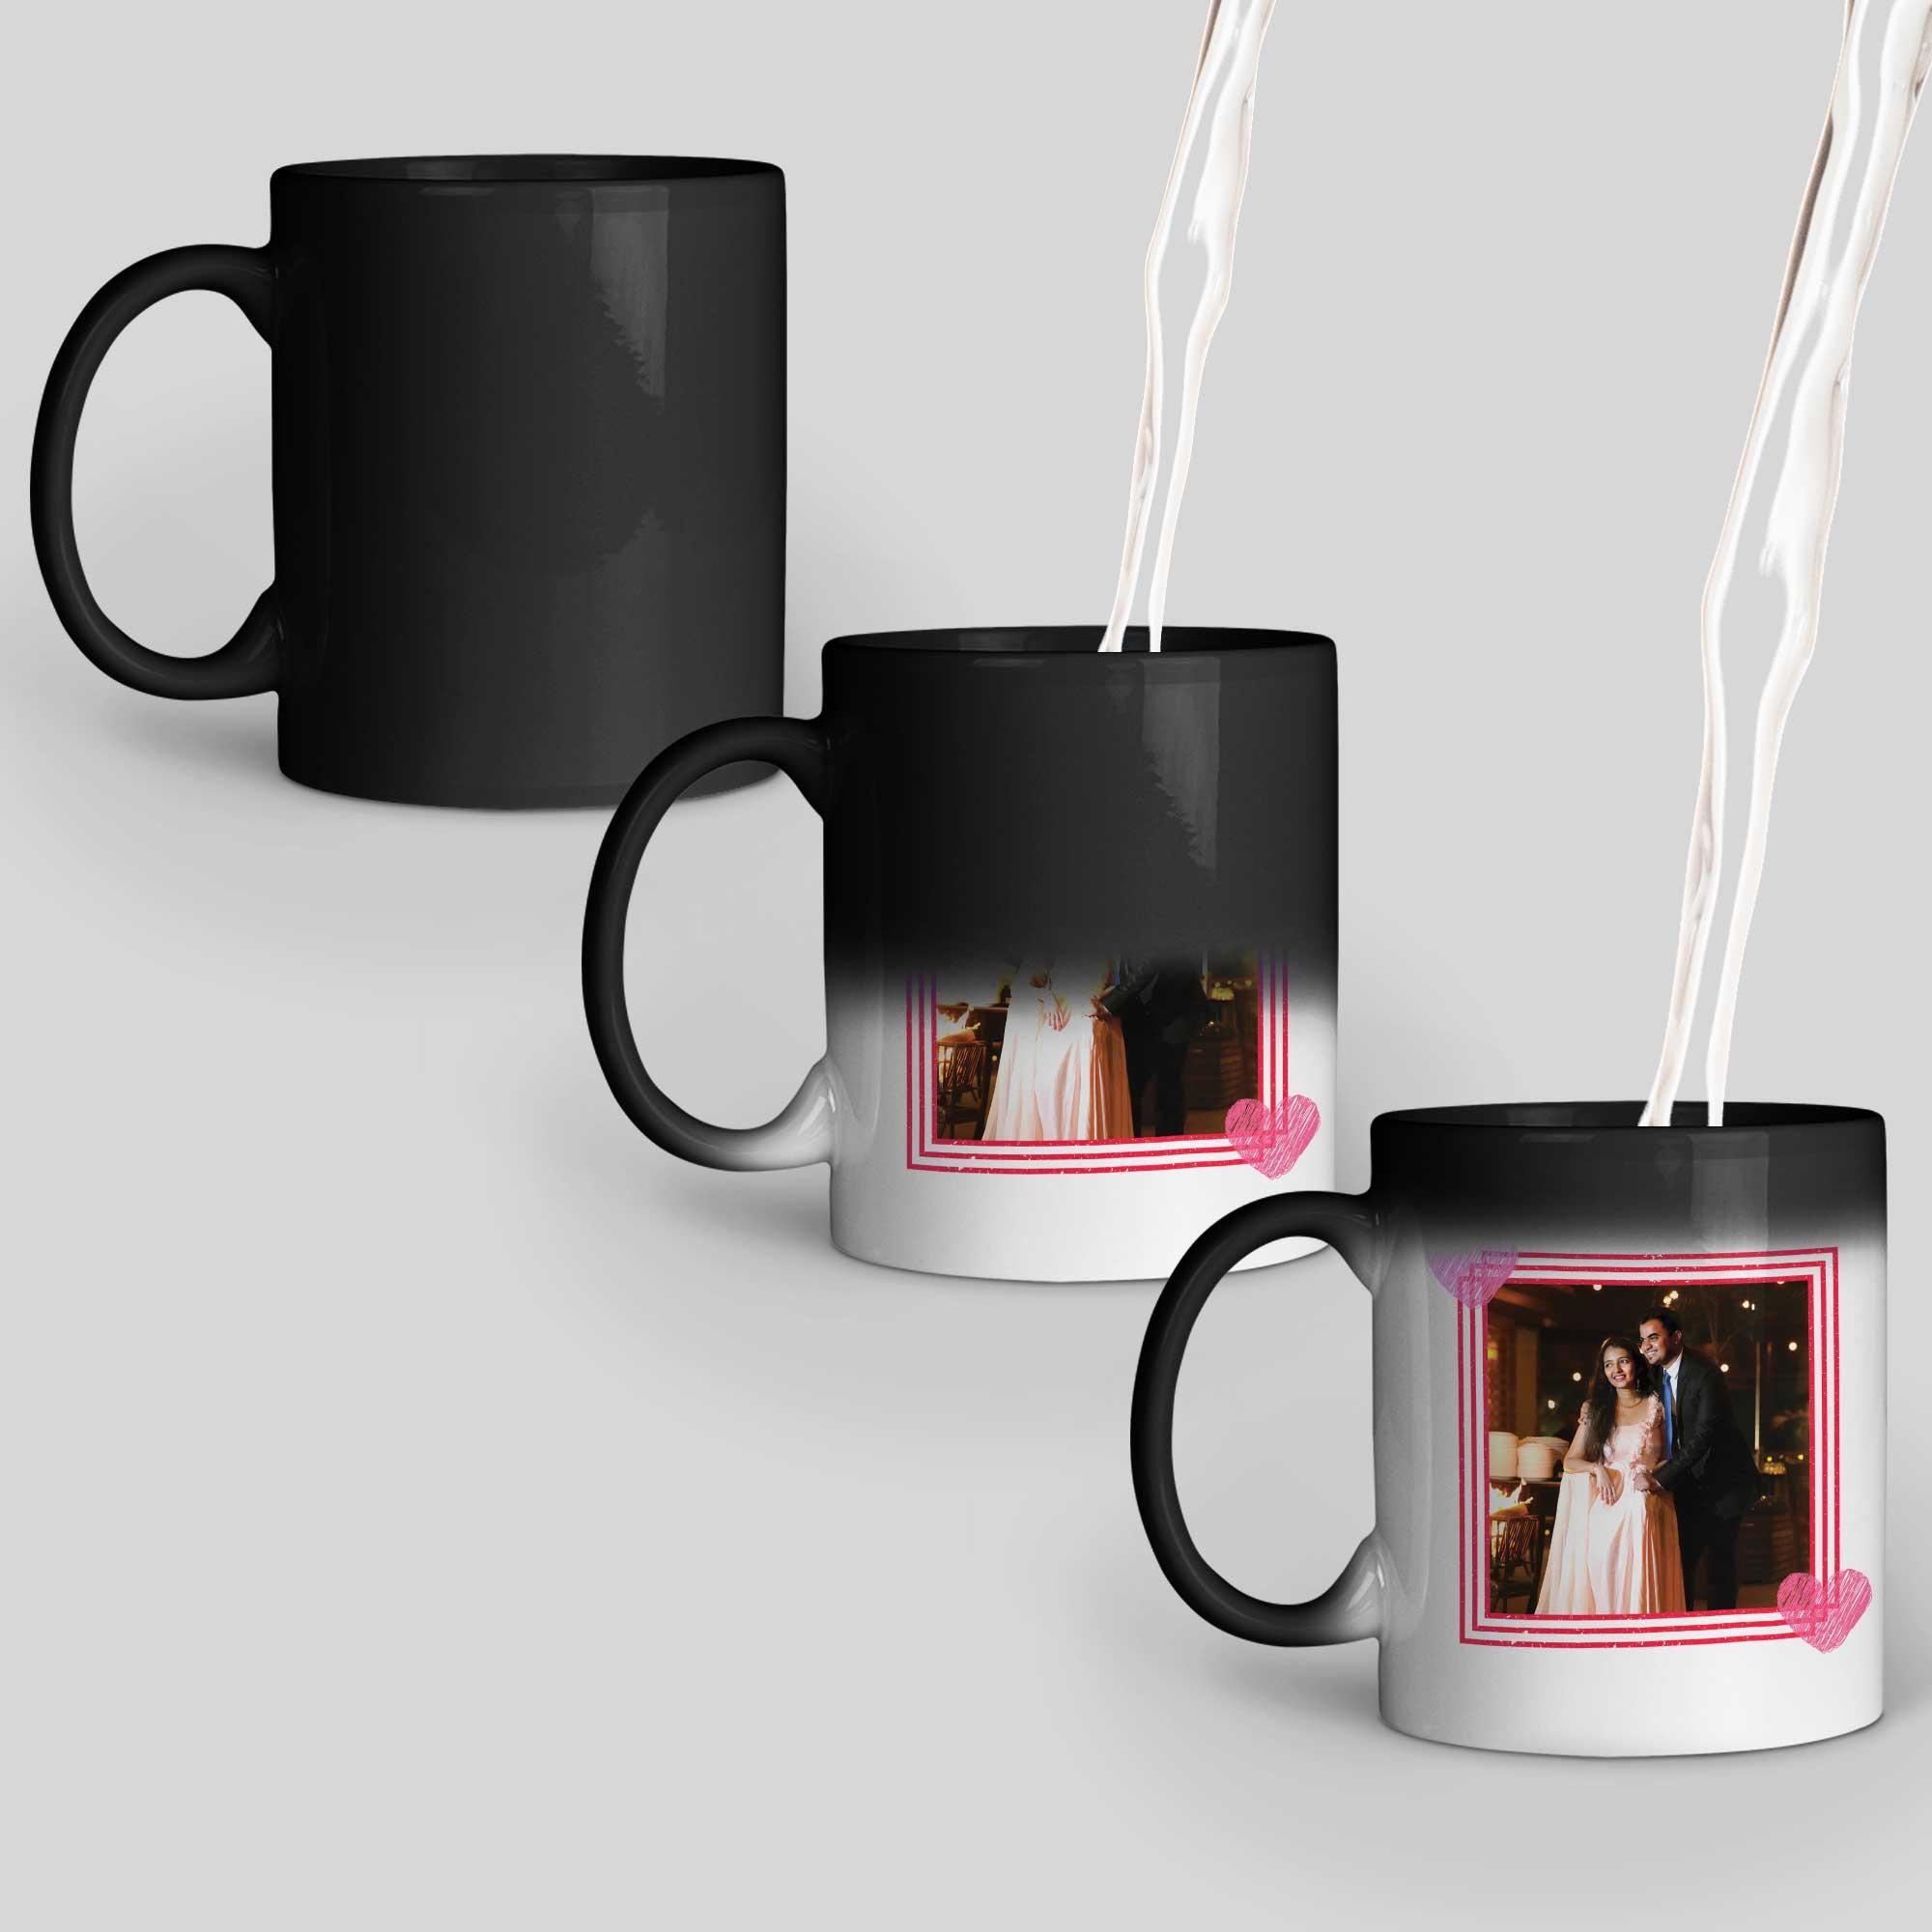 Happy Valentine's Day Personalized Magic Mug